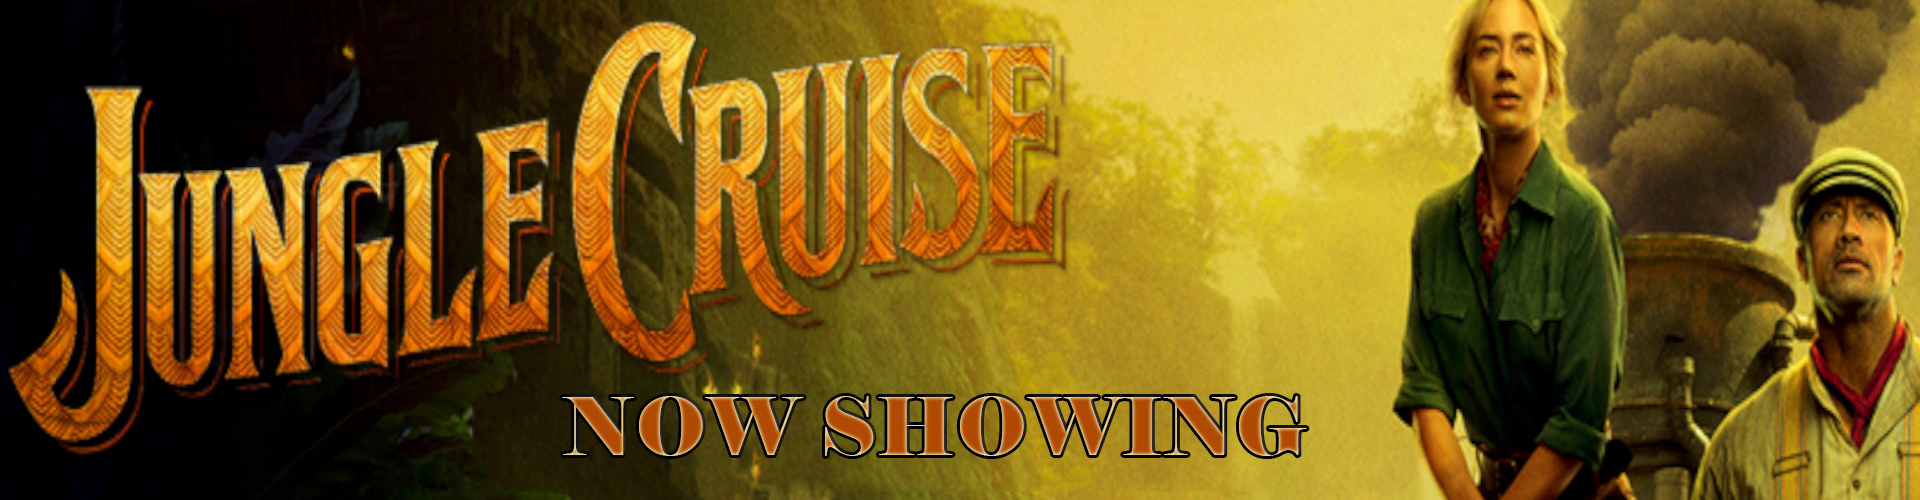 jungle_cruise_now_showing_WebsiteBanner